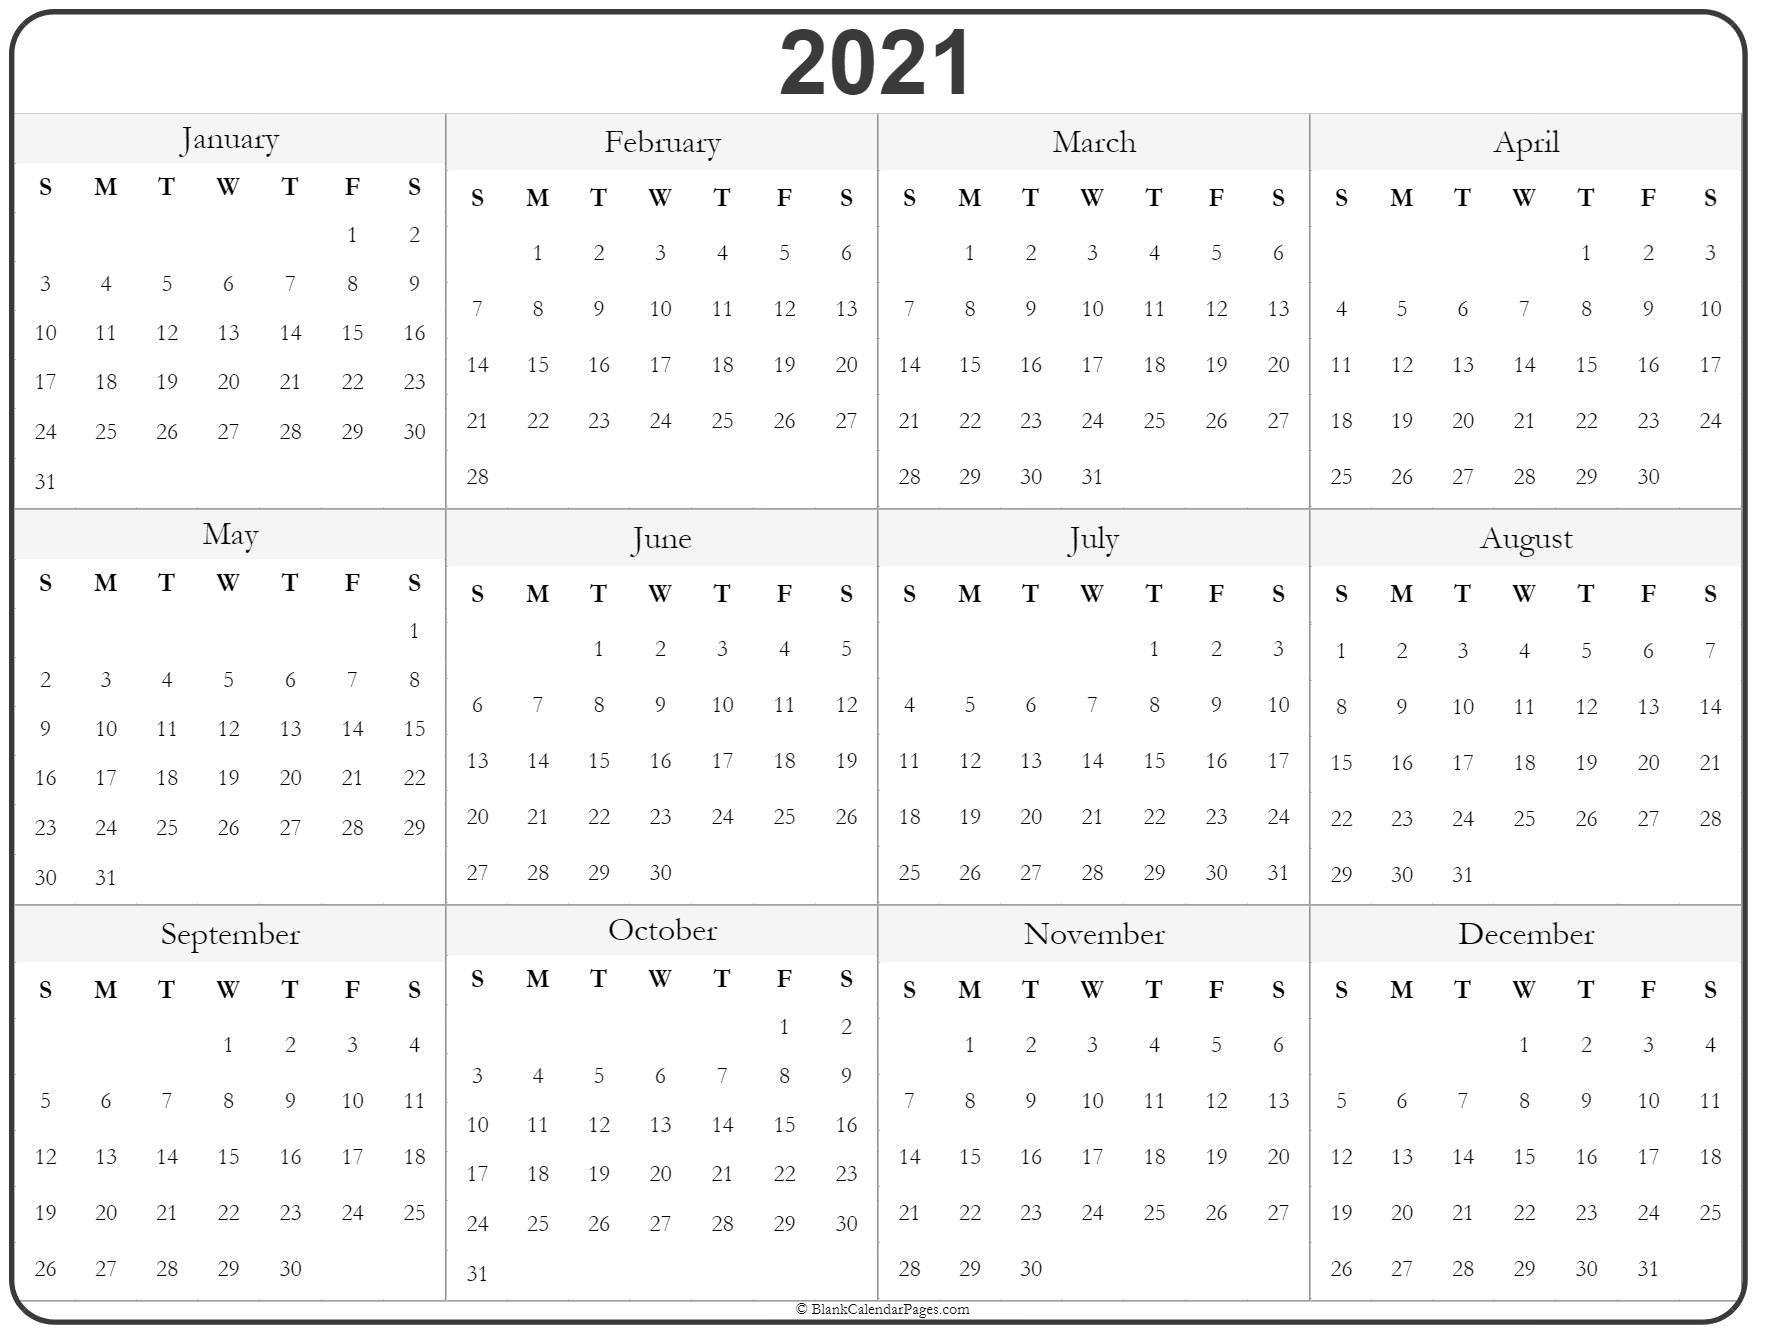 2021 Year Calendar | Yearly Printable pertaining to 2021 Printable Full Year Calendar Image